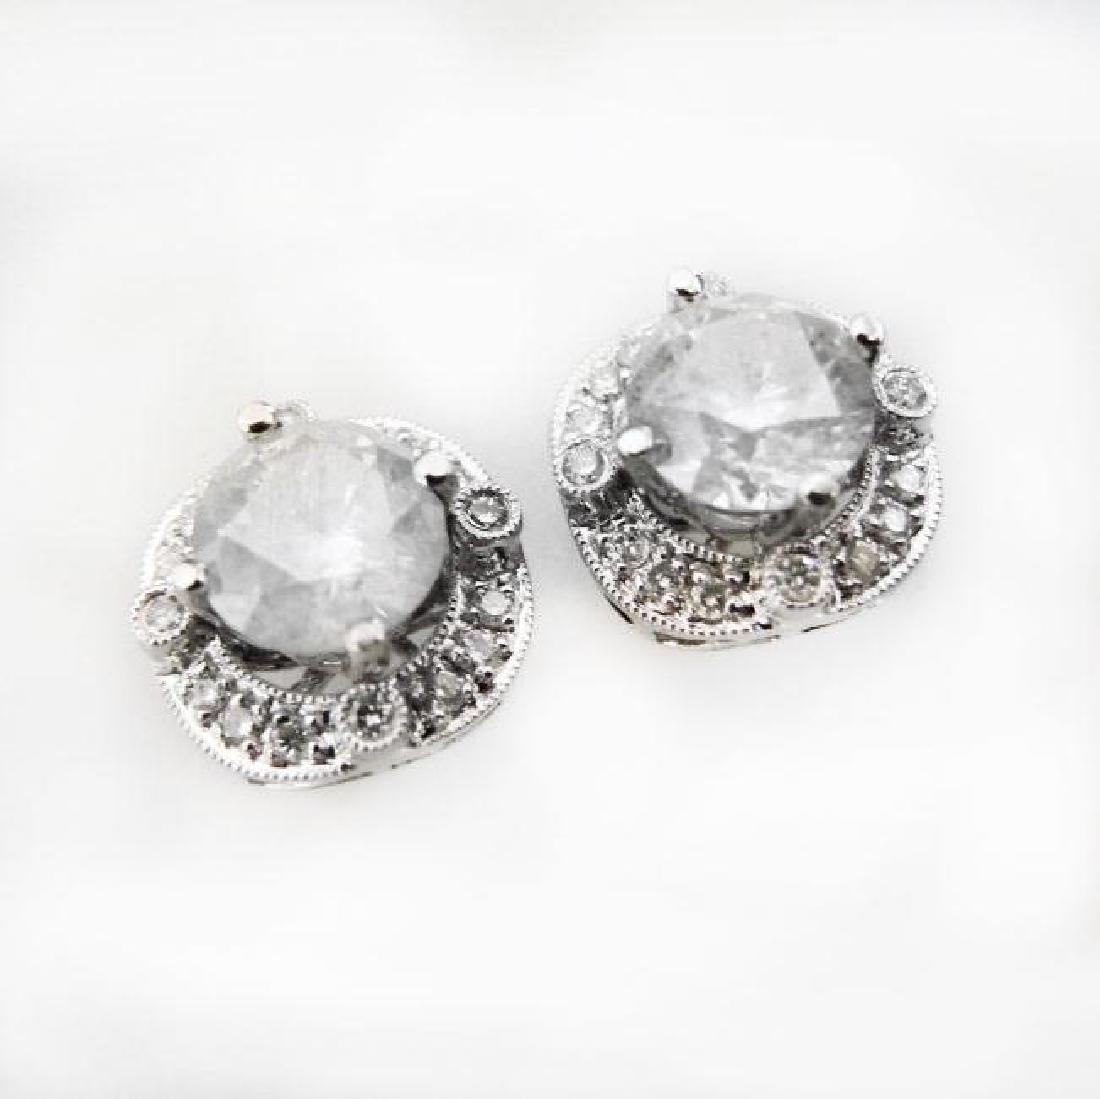 Jacket Stud Earrings Diamond 3.03Ct 18K White Gold - 2